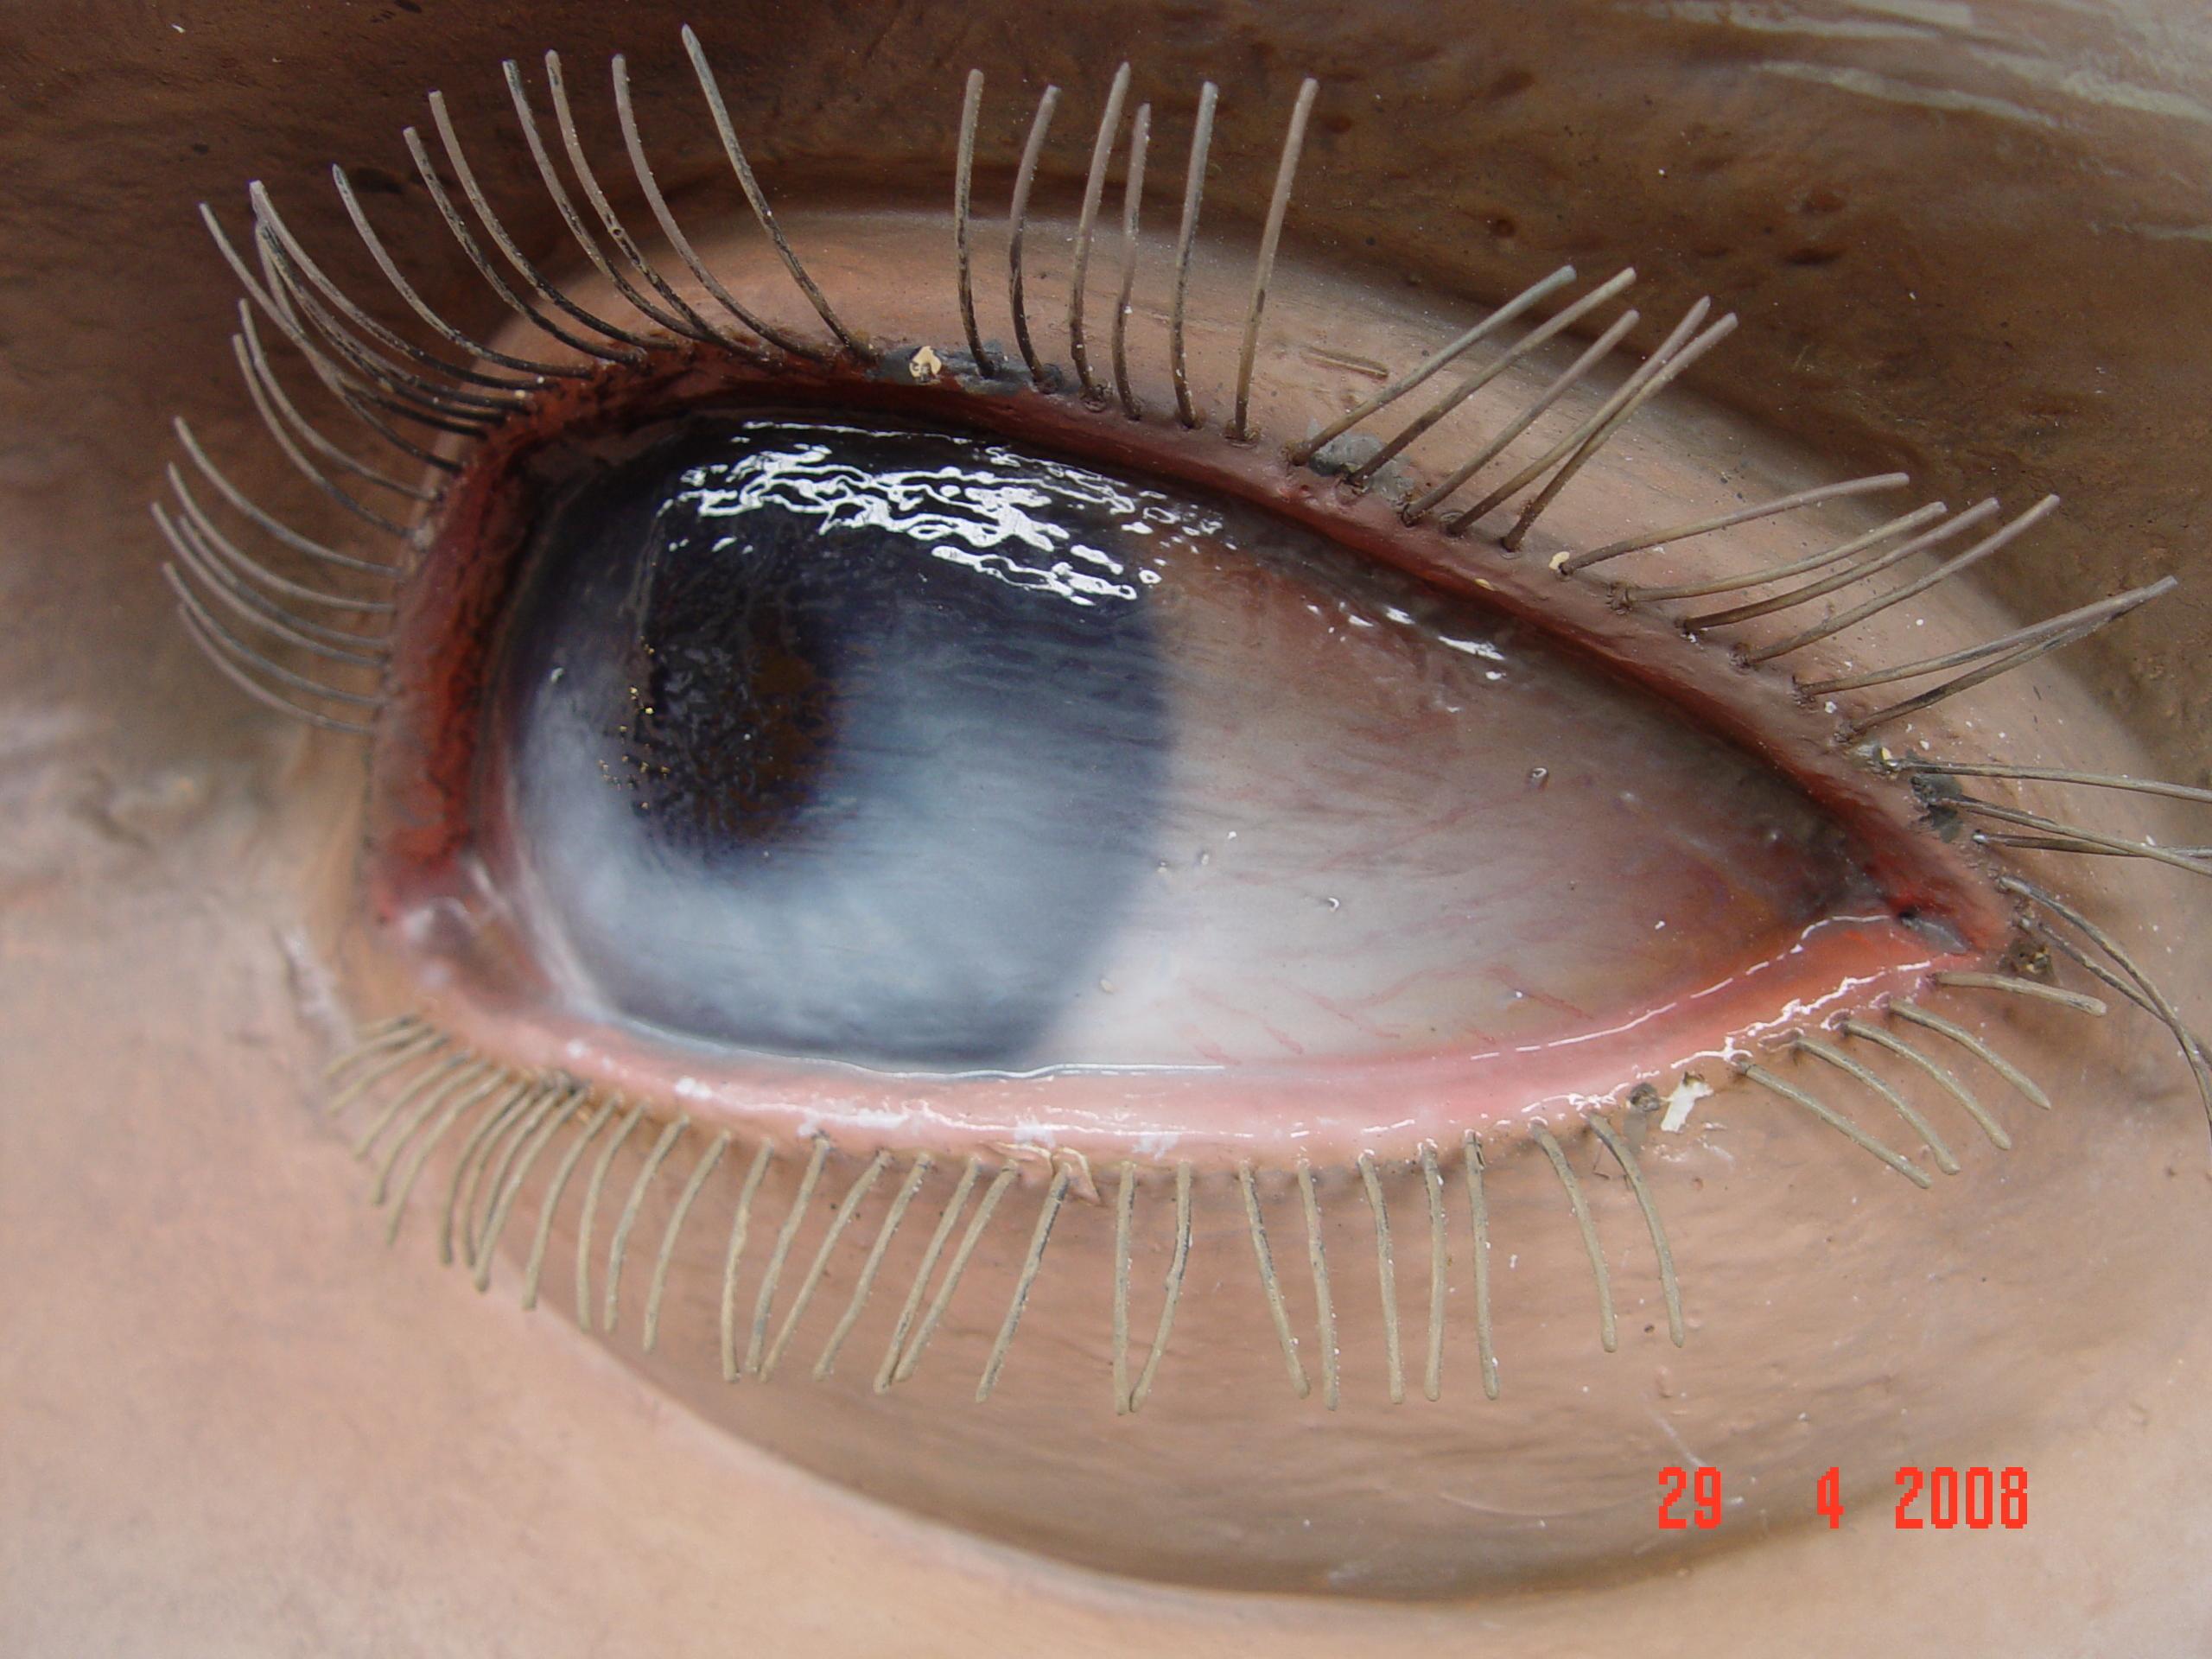 Work Hyper Realistic Eyes